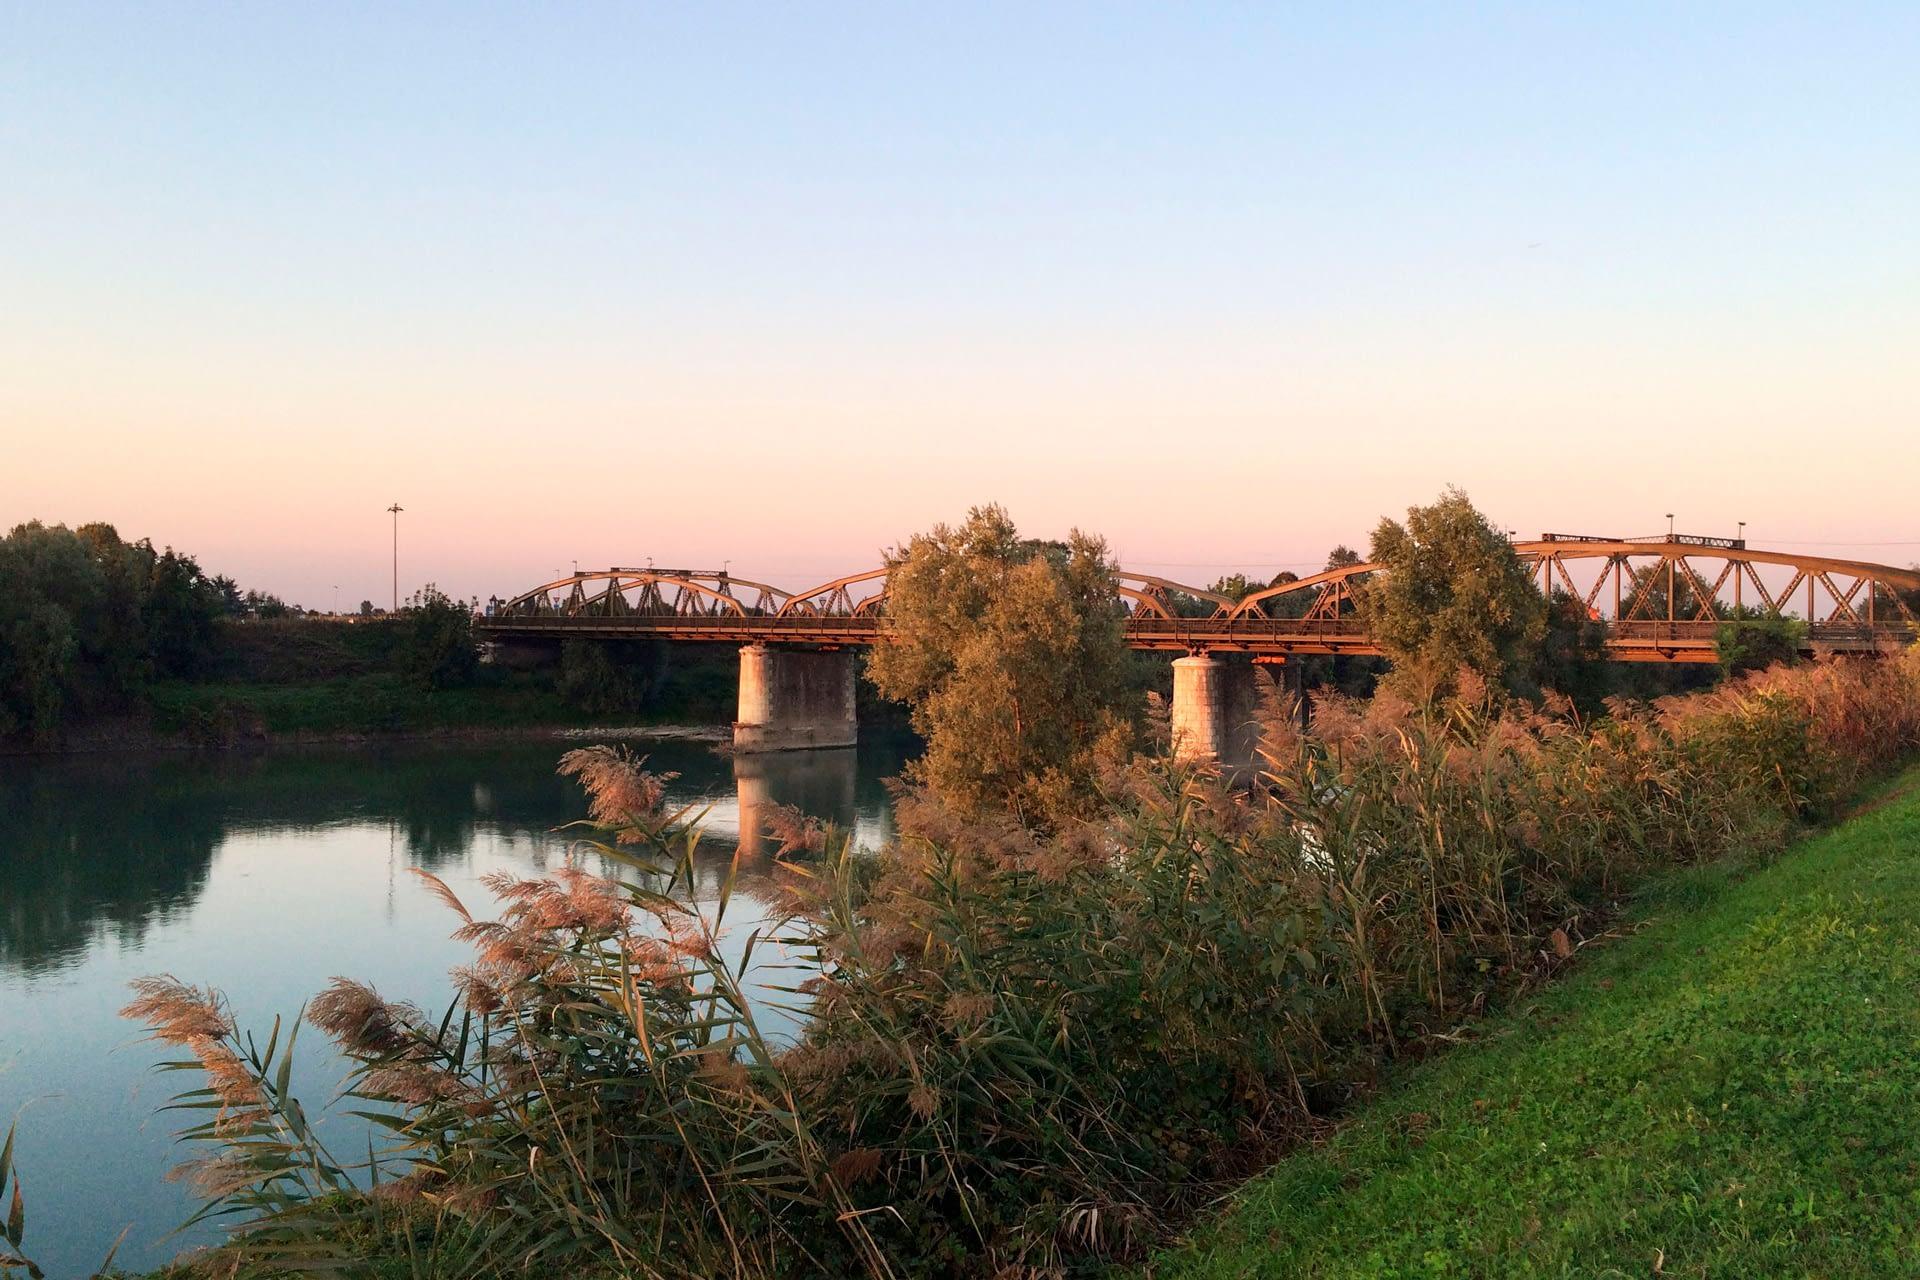 Anguillara Veneta_Il ponte sul fiume Adige